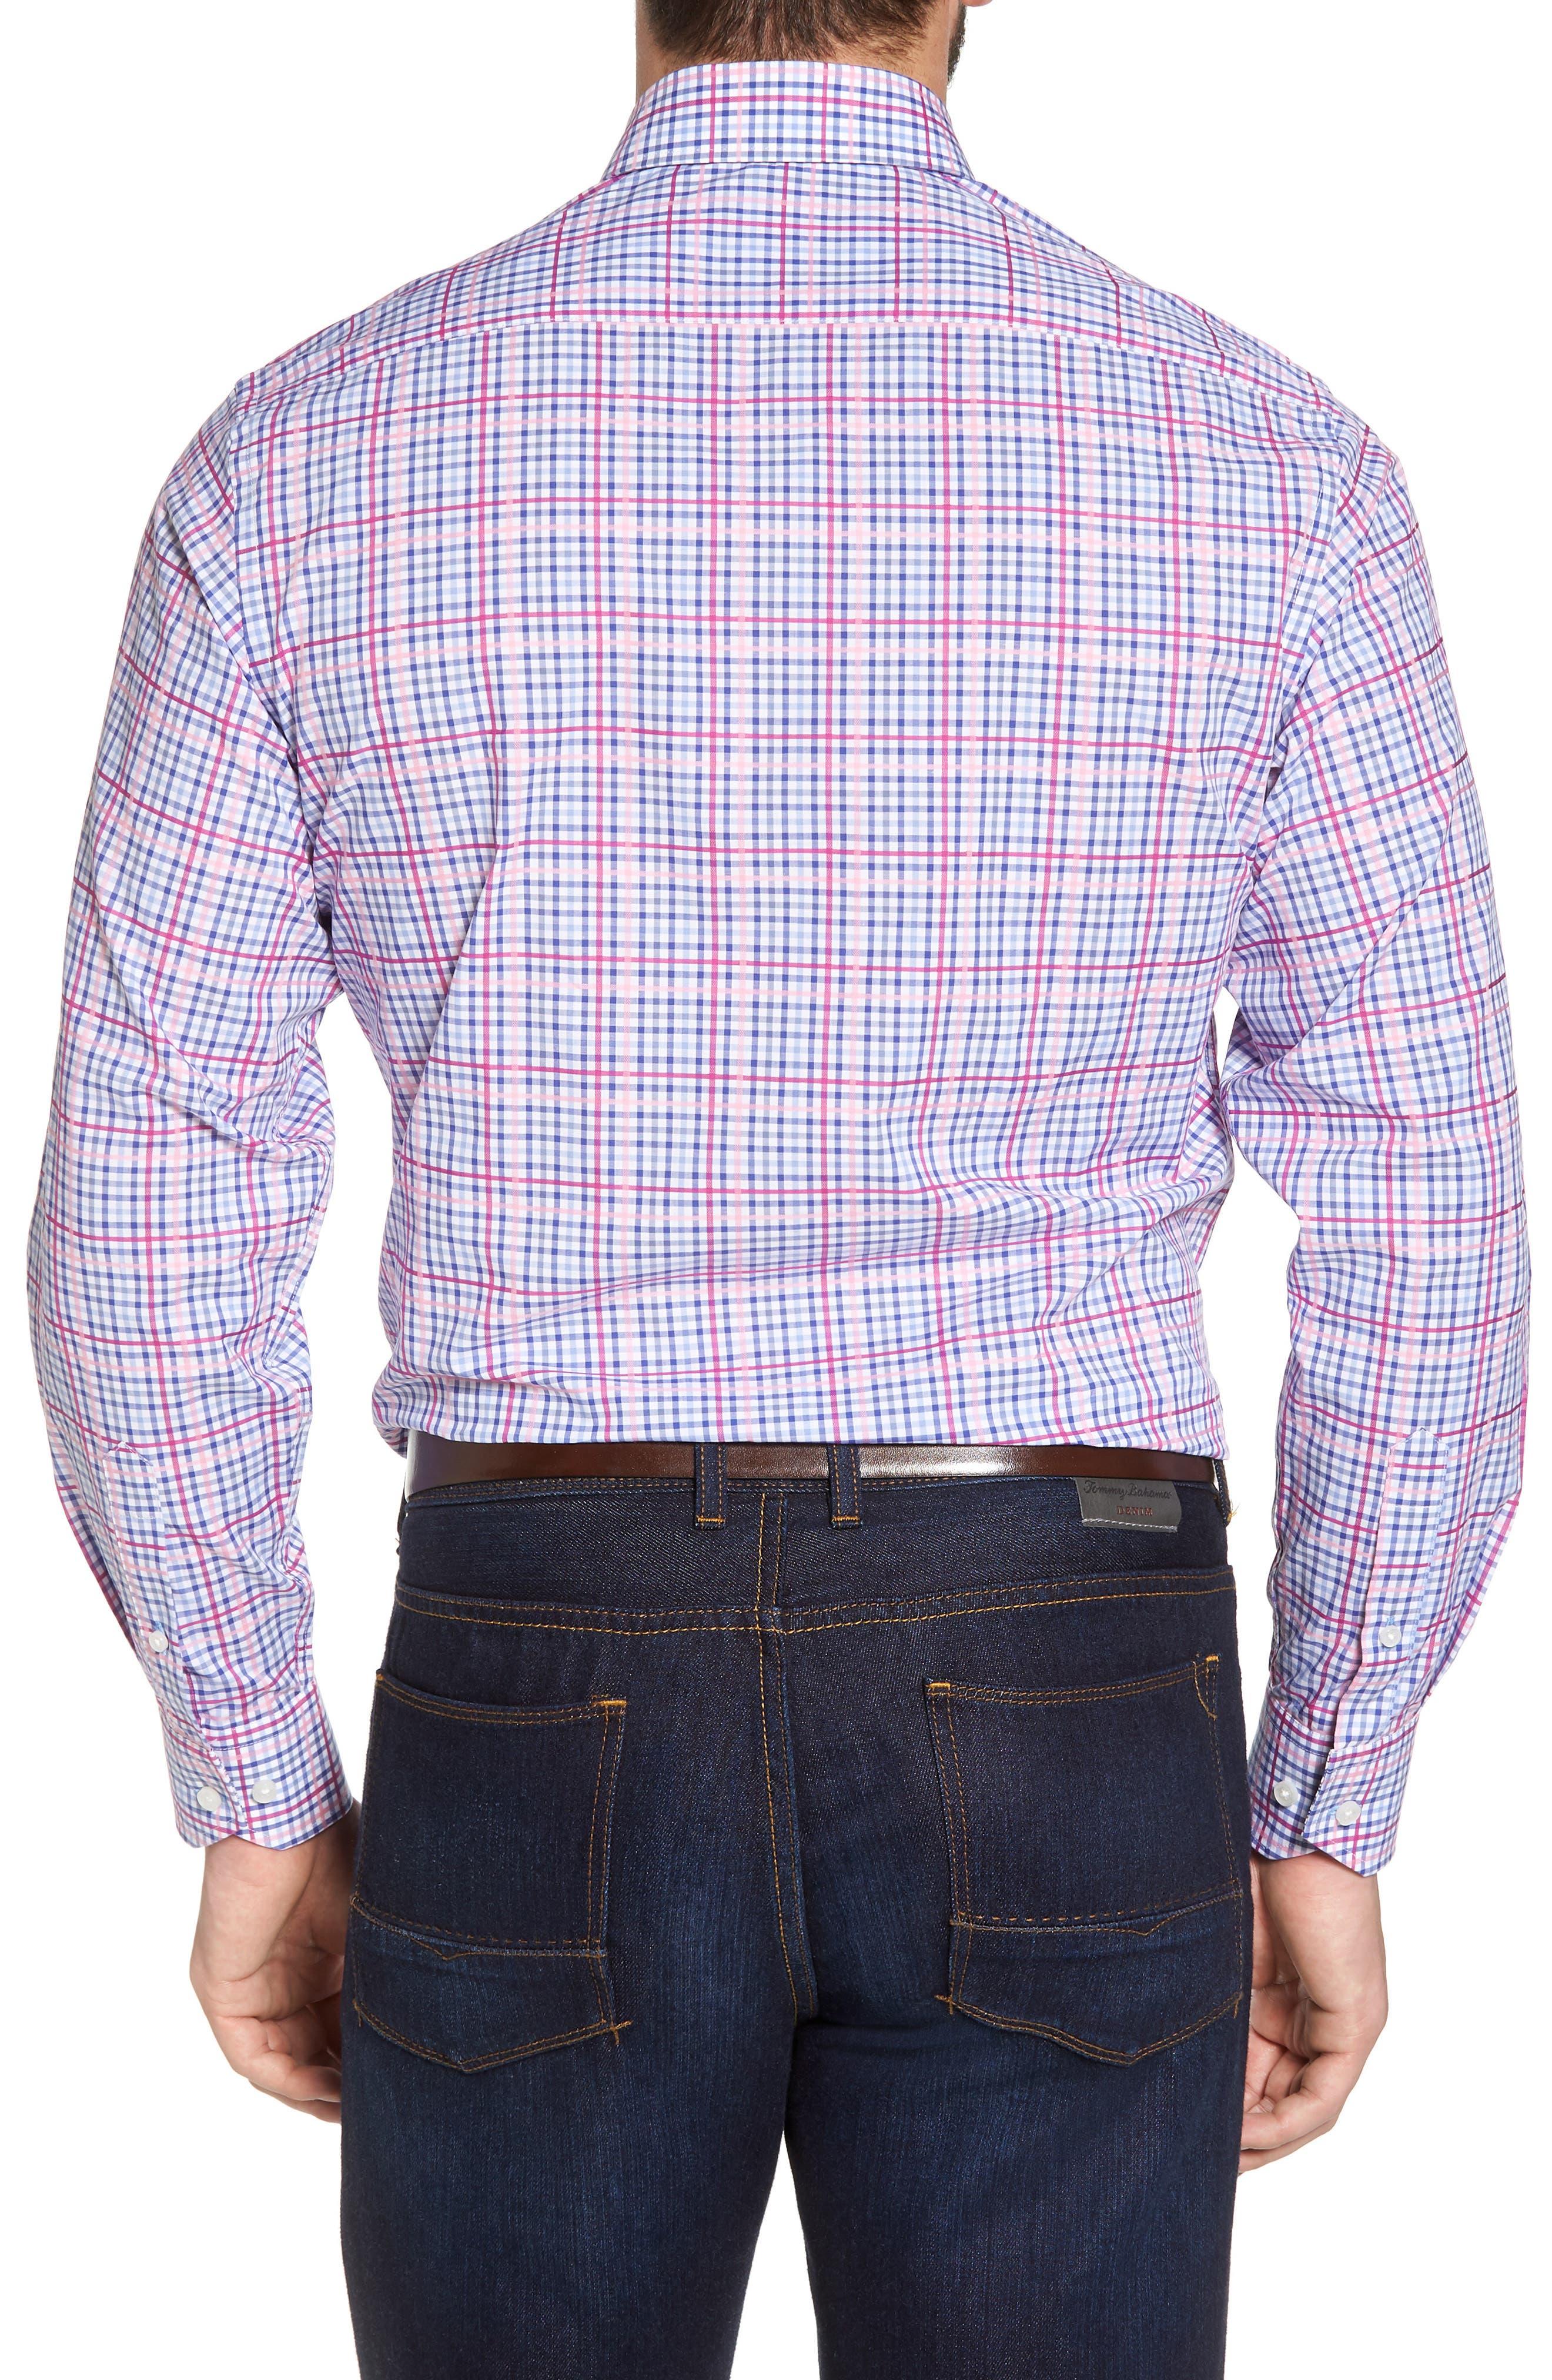 Aidren Regular Fit Plaid Sport Shirt,                             Alternate thumbnail 3, color,                             Pink